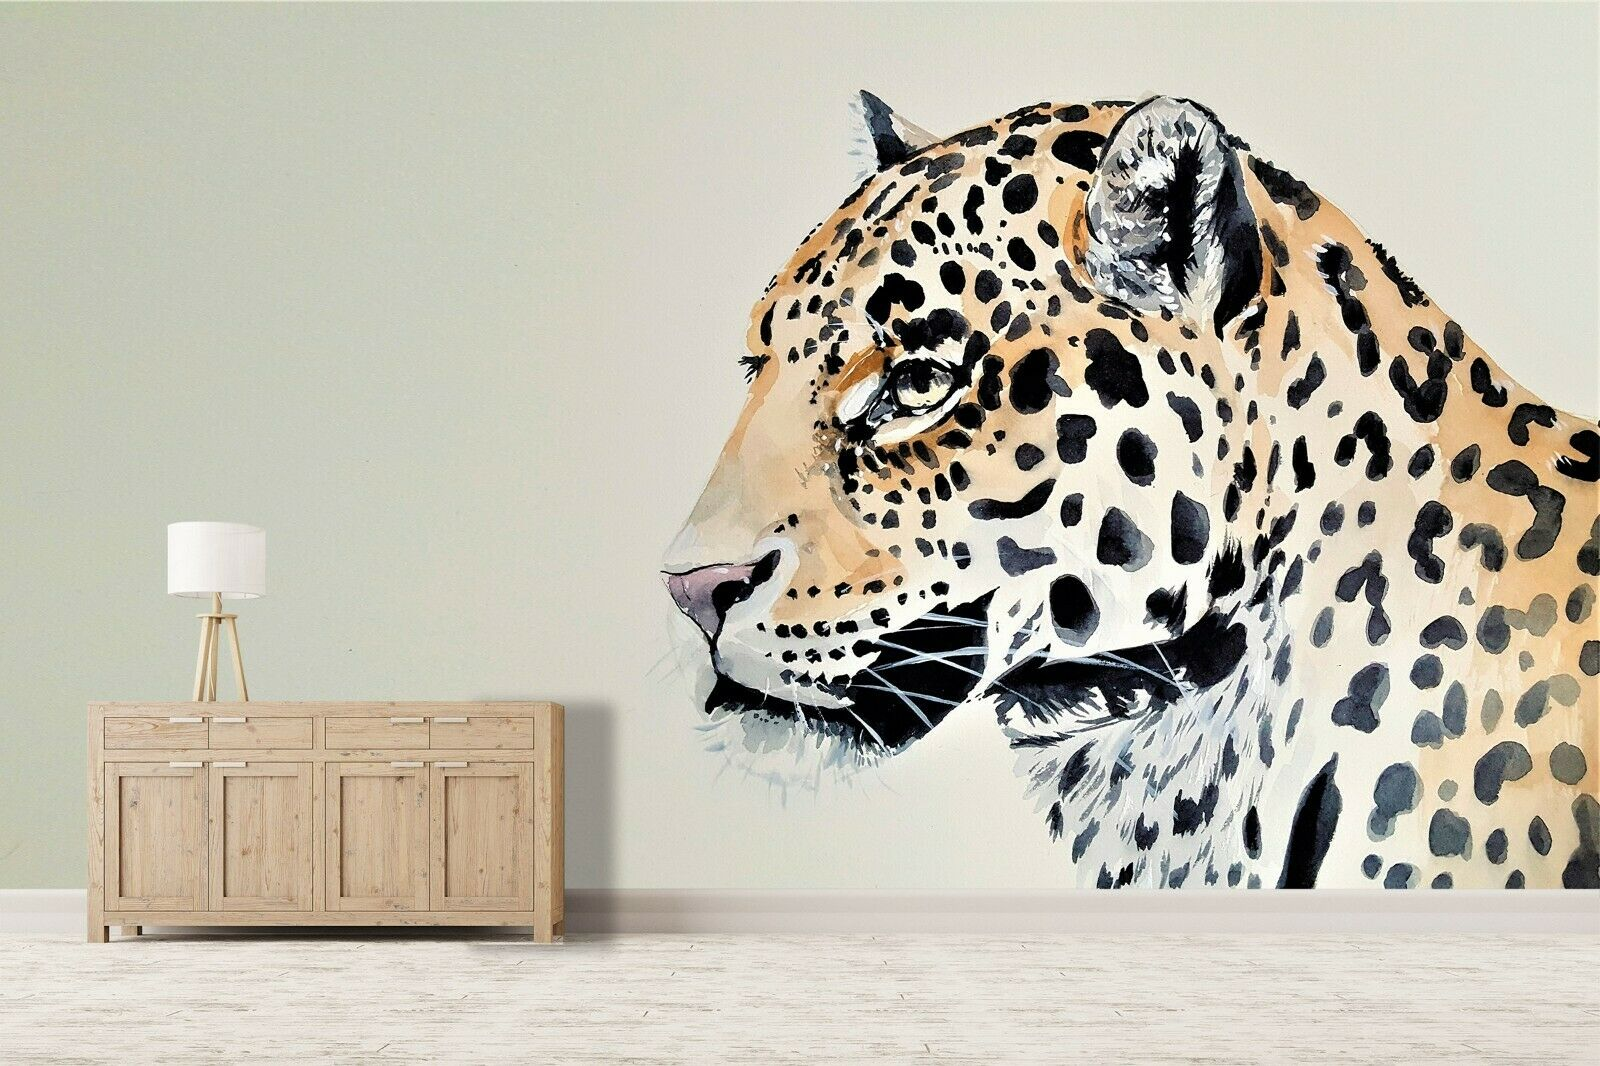 3D Malen Gepard Q22 Tier Tapete Wandbild Selbstklebend Abnehmbare Acmy